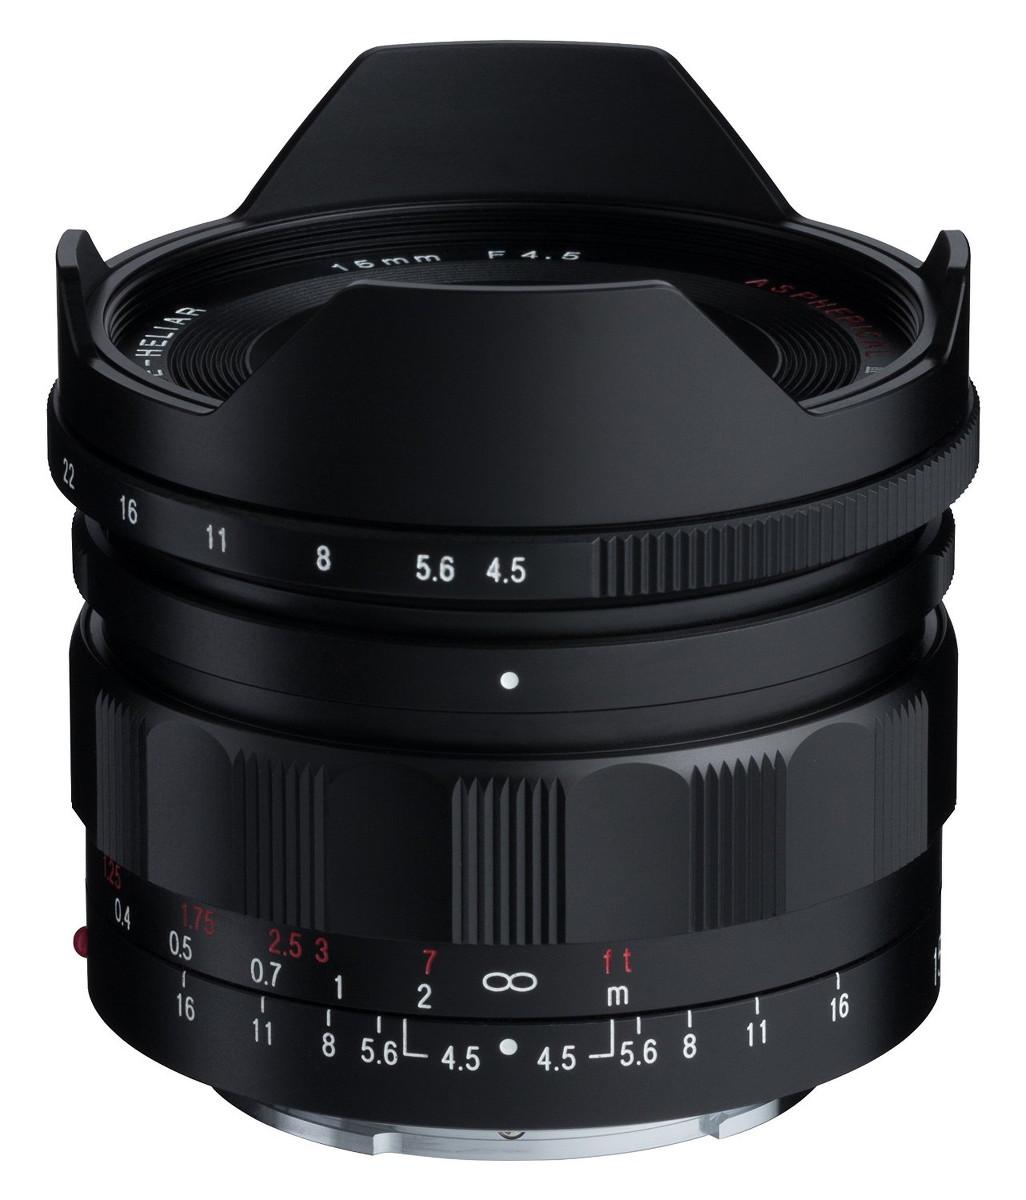 COSINA フォクトレンダー│Voigtlander SUPER WIDE-HELIAR 15mm F4.5 ASPHERICAL III - ソニーEマウント対応 単焦点広角レンズ ブラック